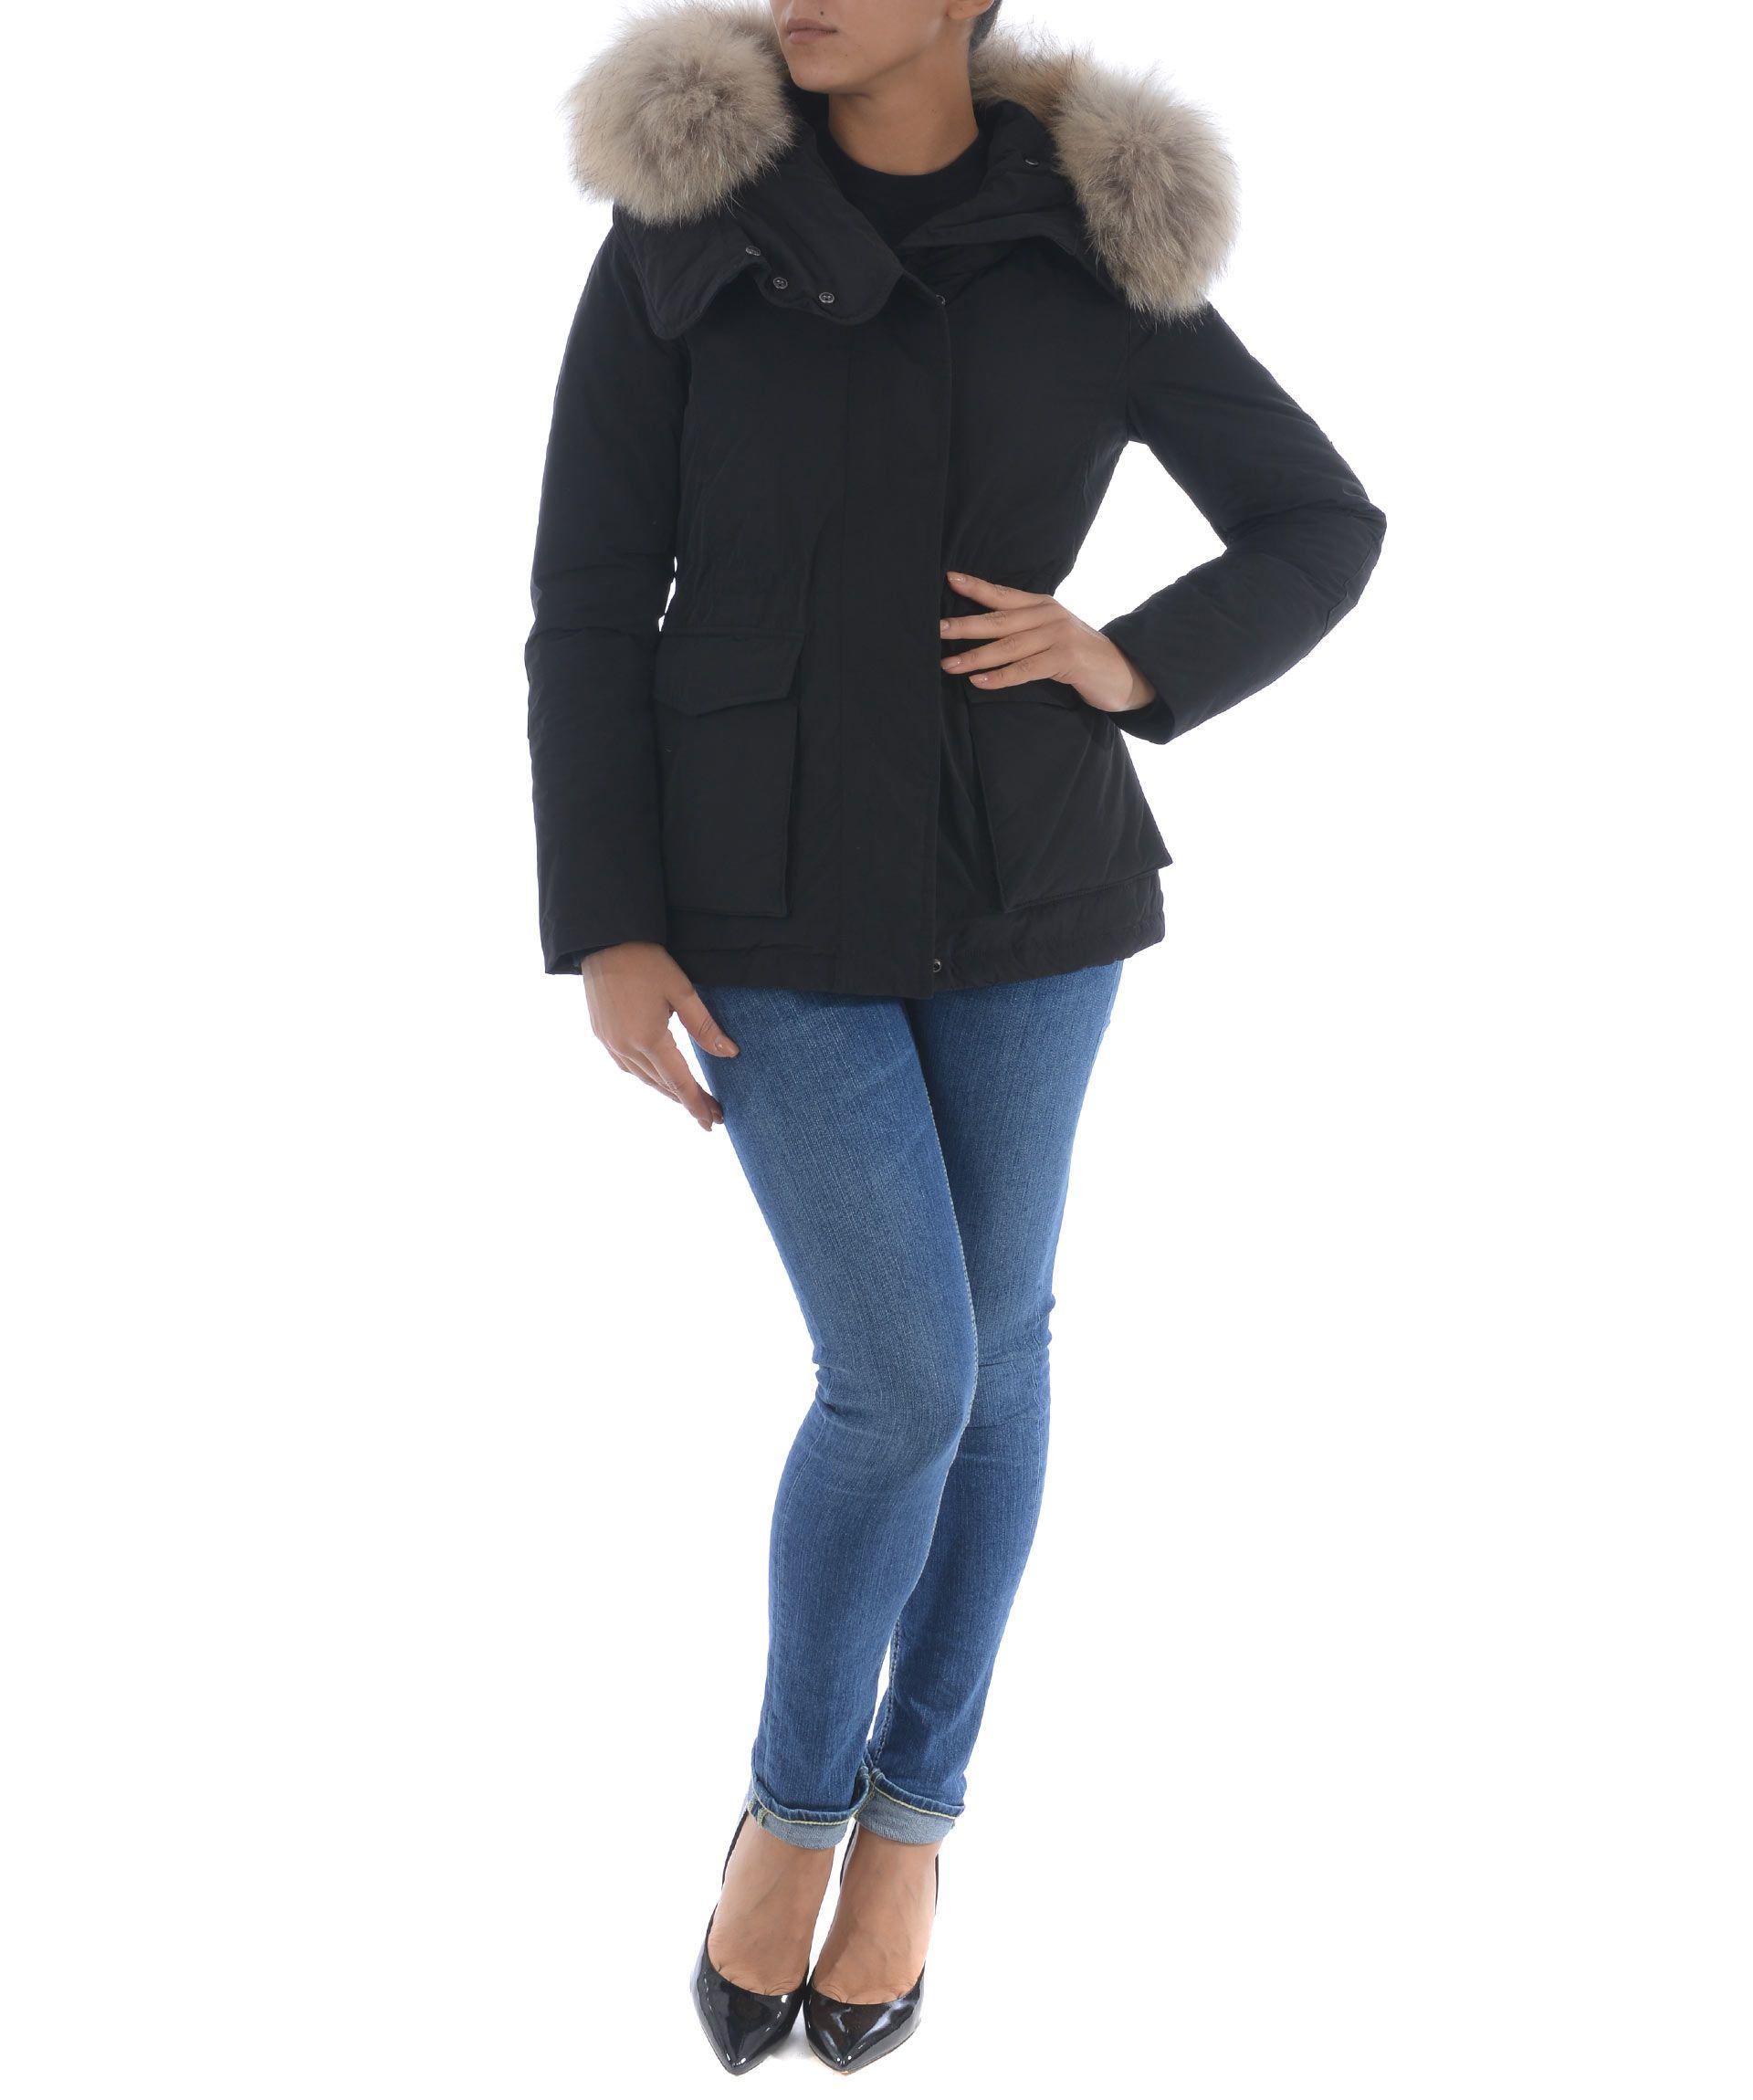 woolrich woolrich military parka nero women 39 s coats. Black Bedroom Furniture Sets. Home Design Ideas